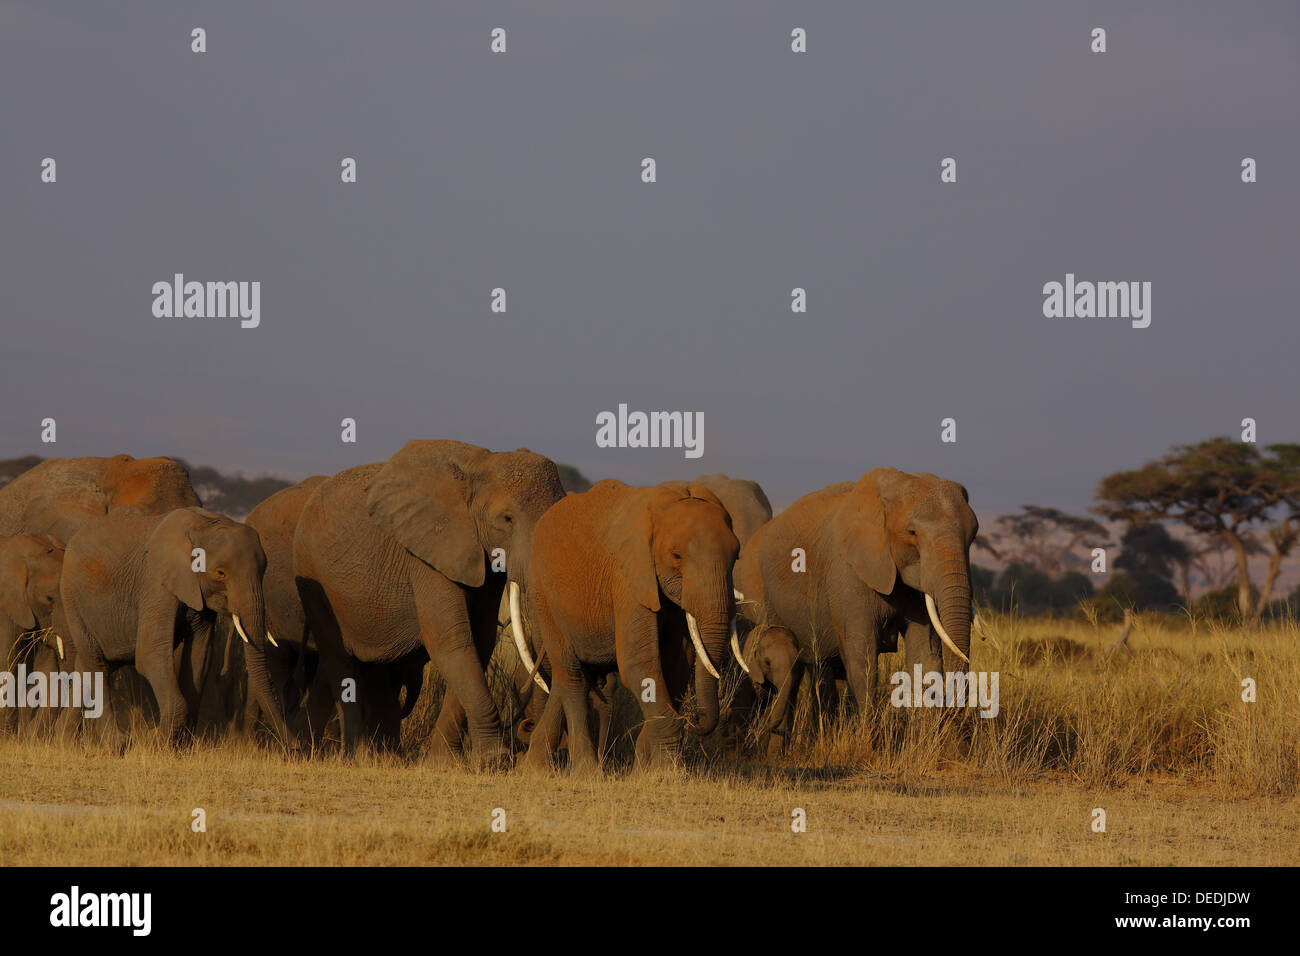 Herd of African Elephants (Loxodonta africana) in Amboseli National Park in Kenya - Stock Image